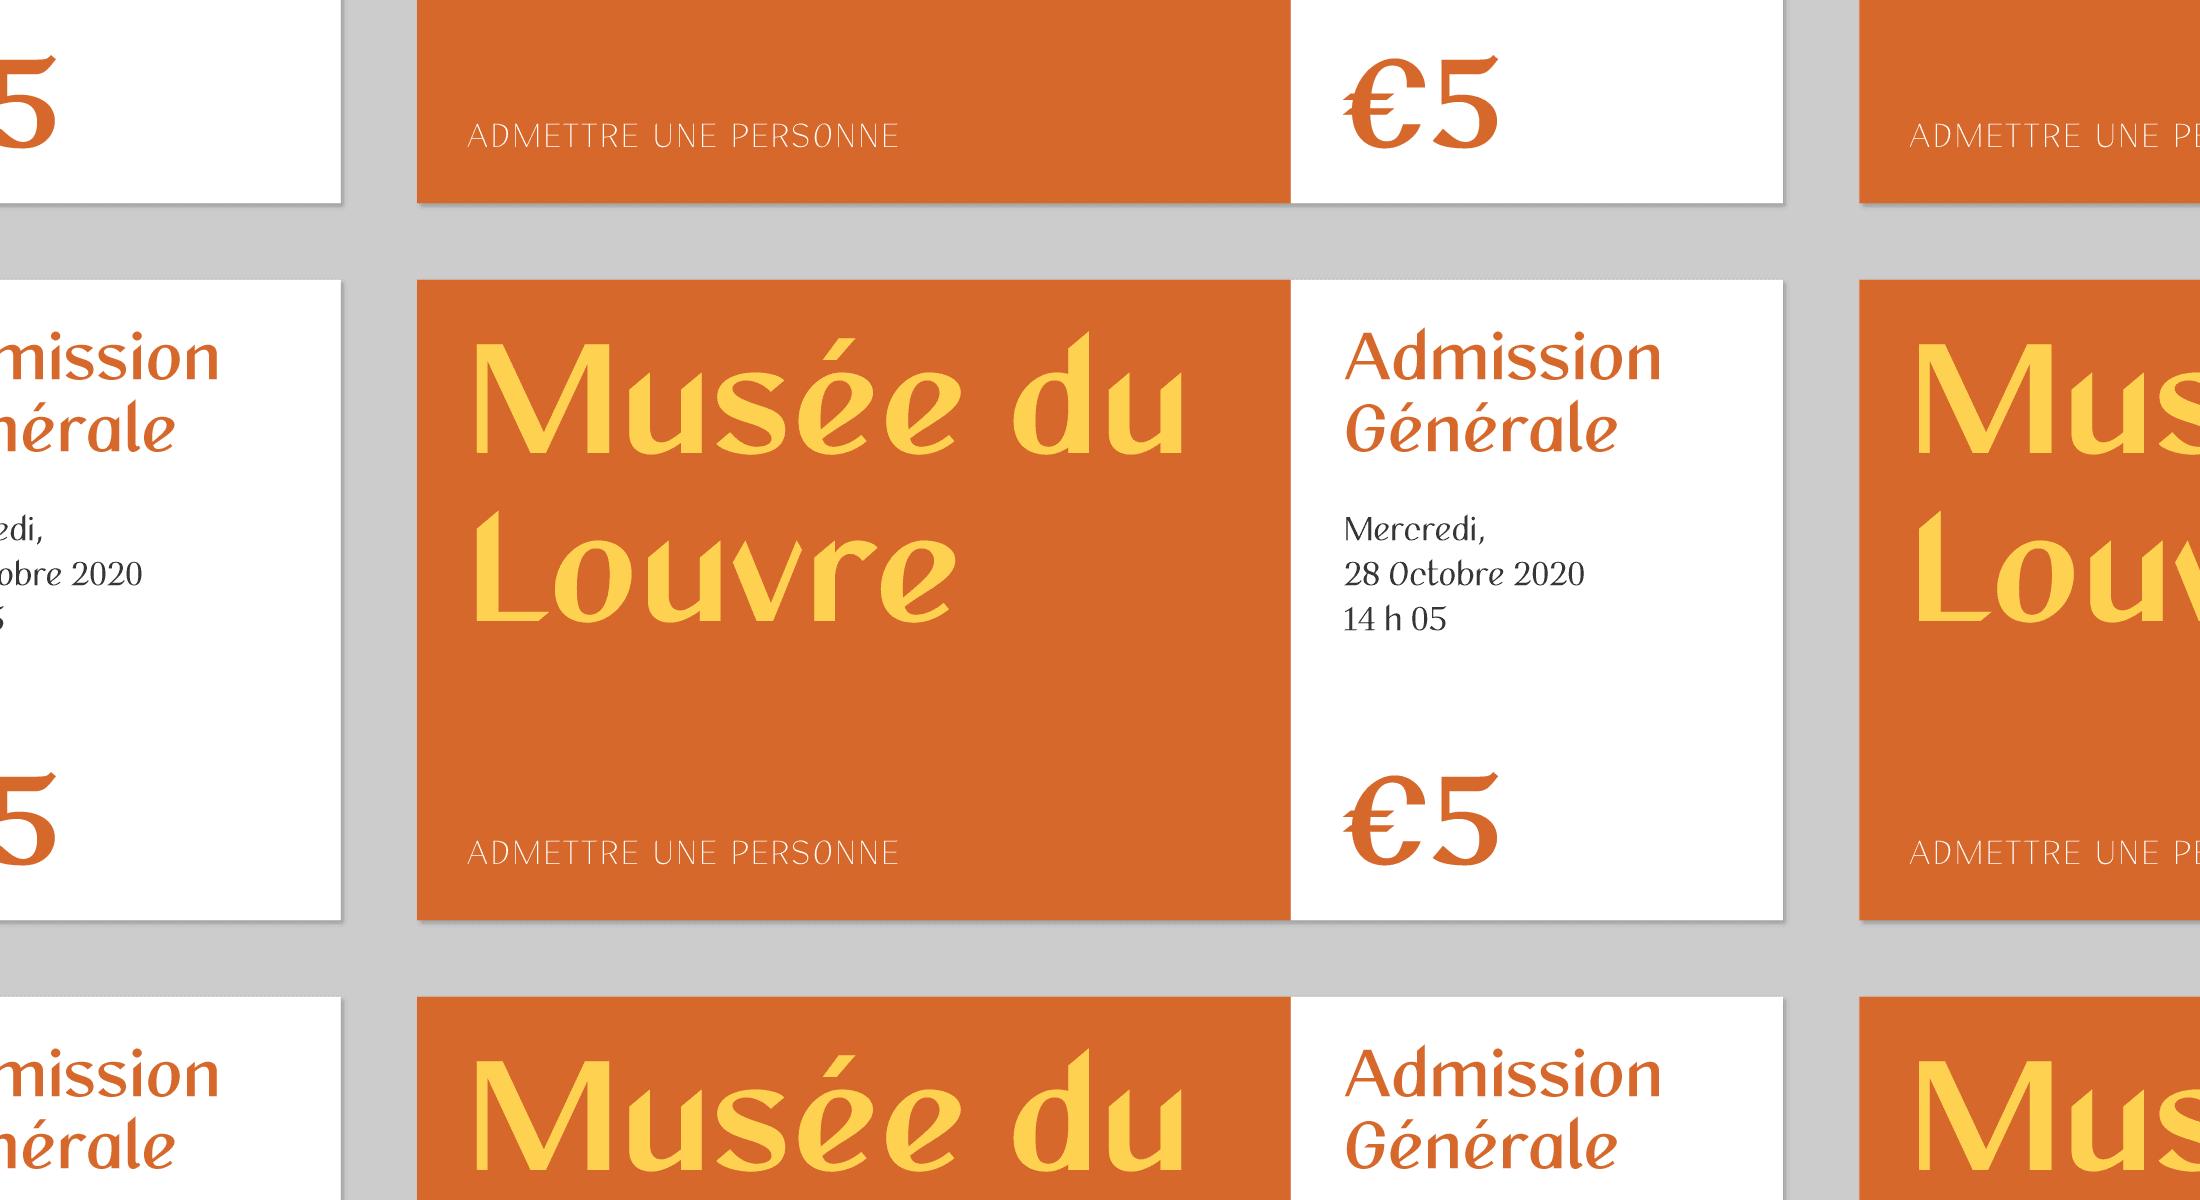 A mockup of Larsson Sans typeface